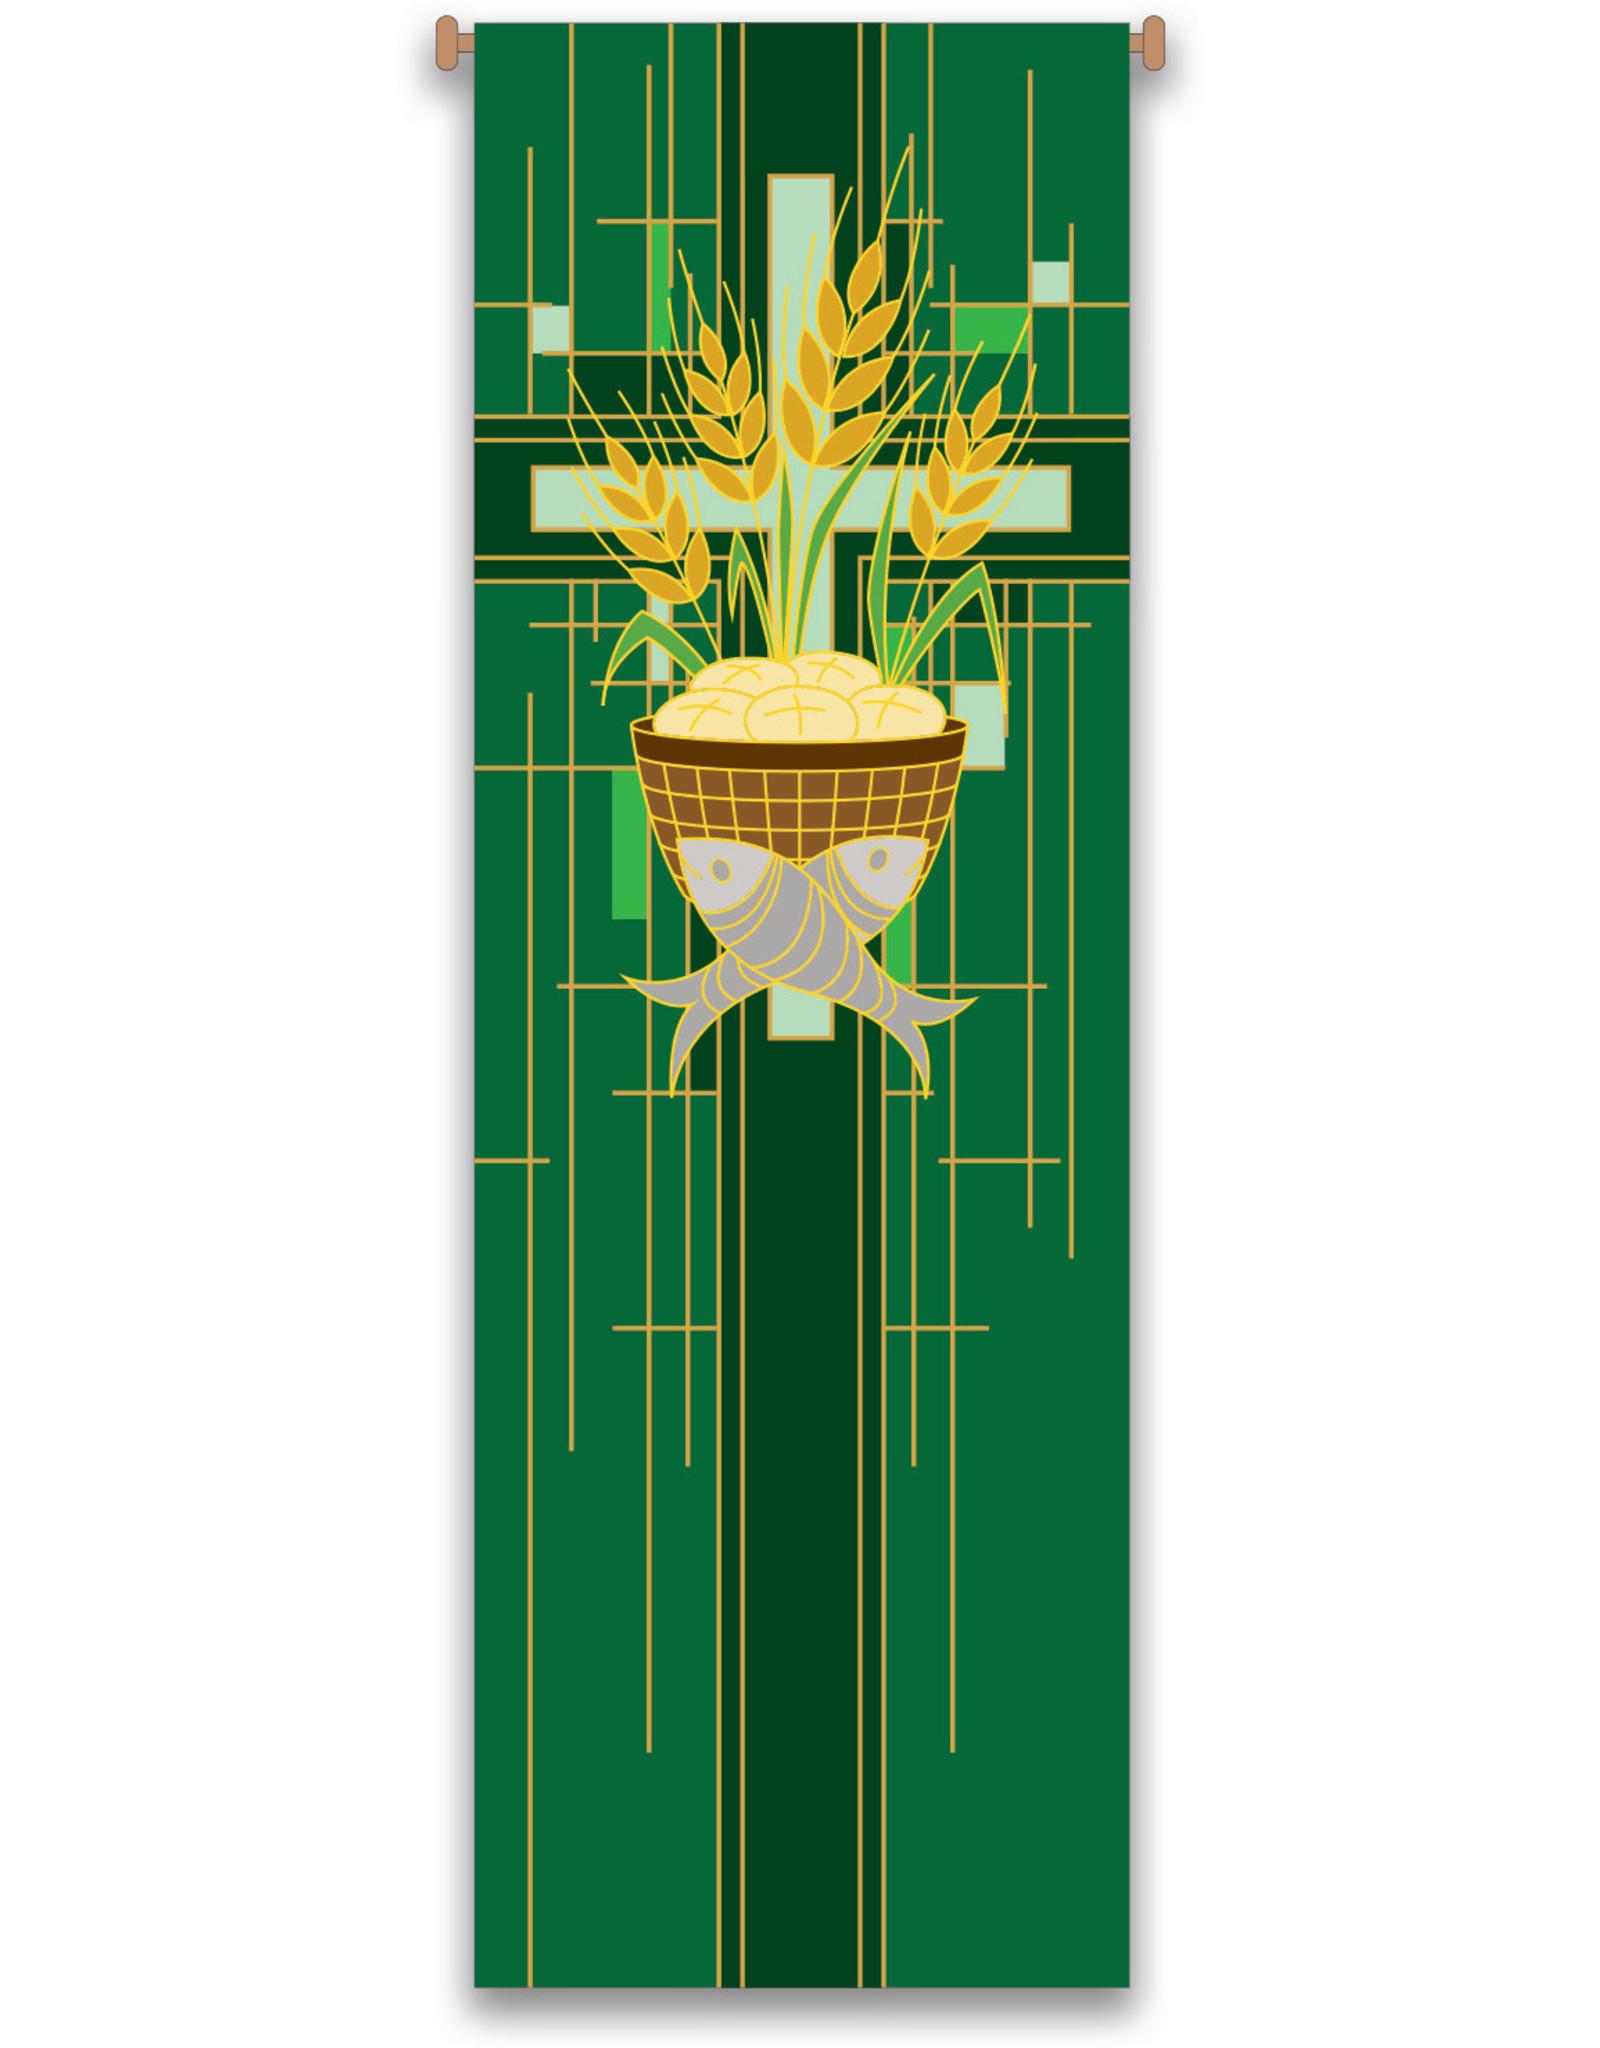 Green Host/Fish/Wheat/Cross Banner